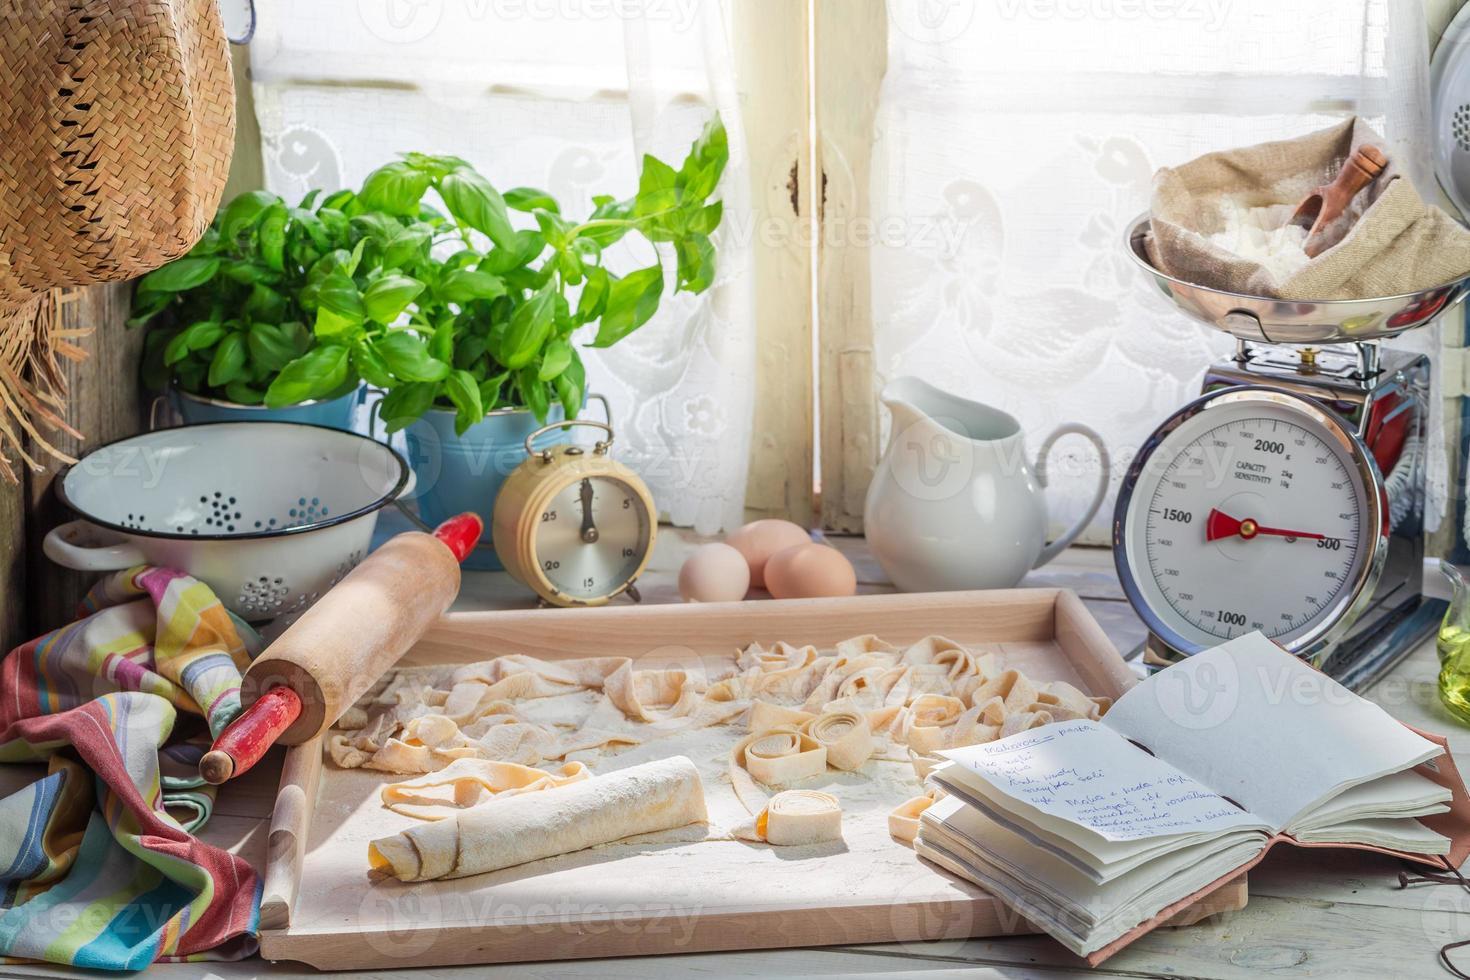 preparações para tagliatelle de ingredientes frescos foto